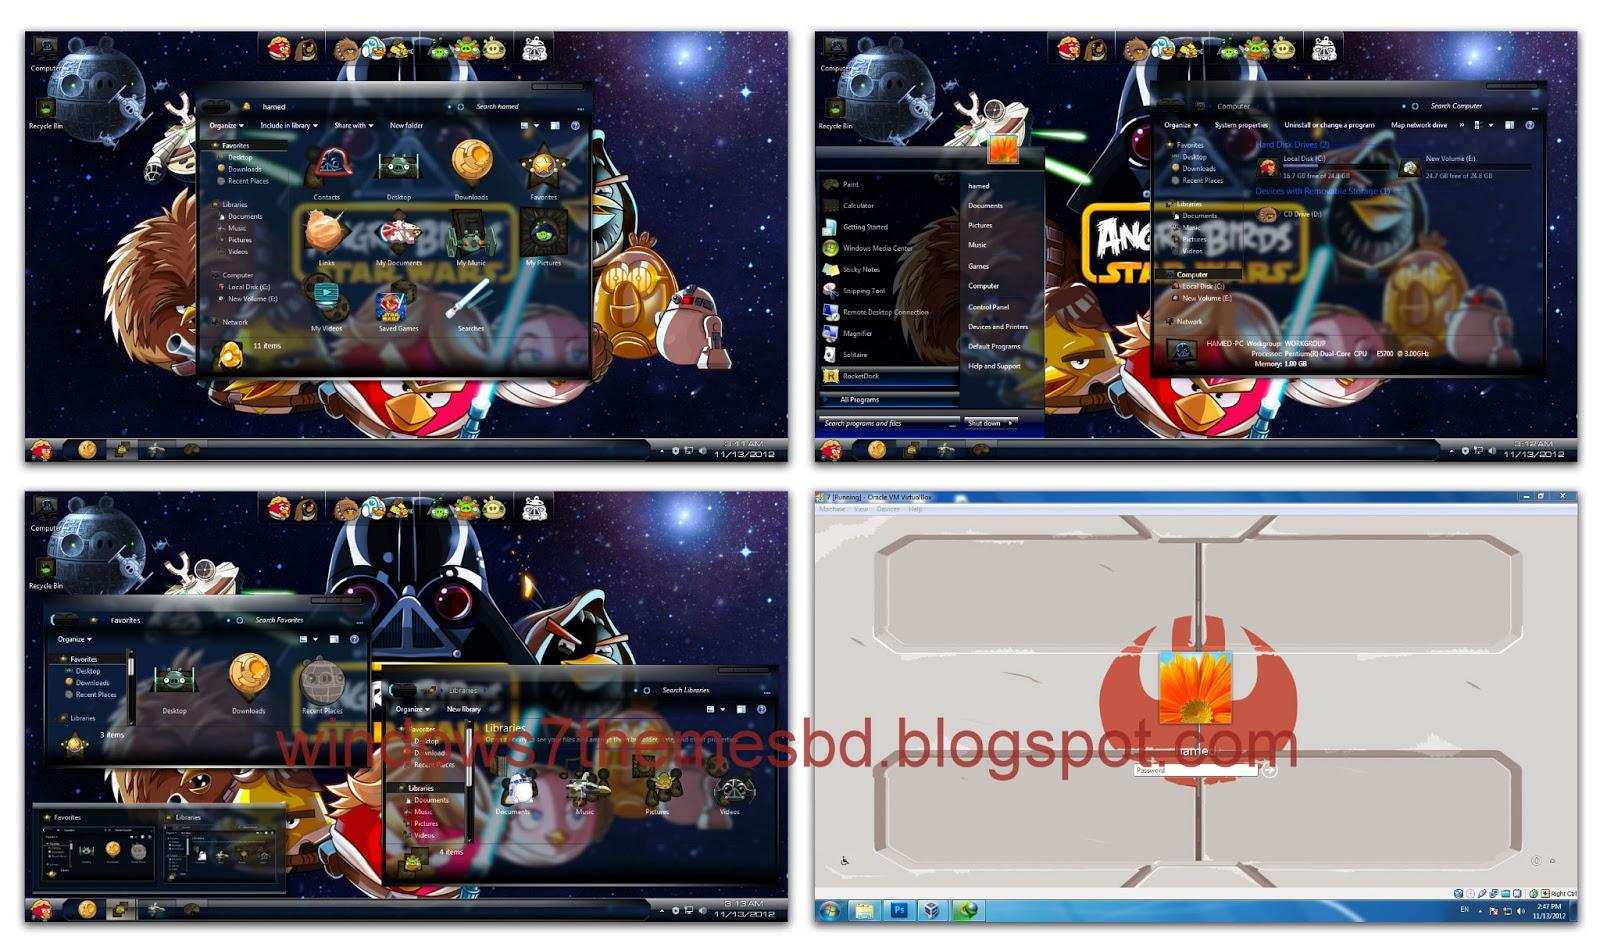 ransform Windows 7 to Angry Birds StarWars Game